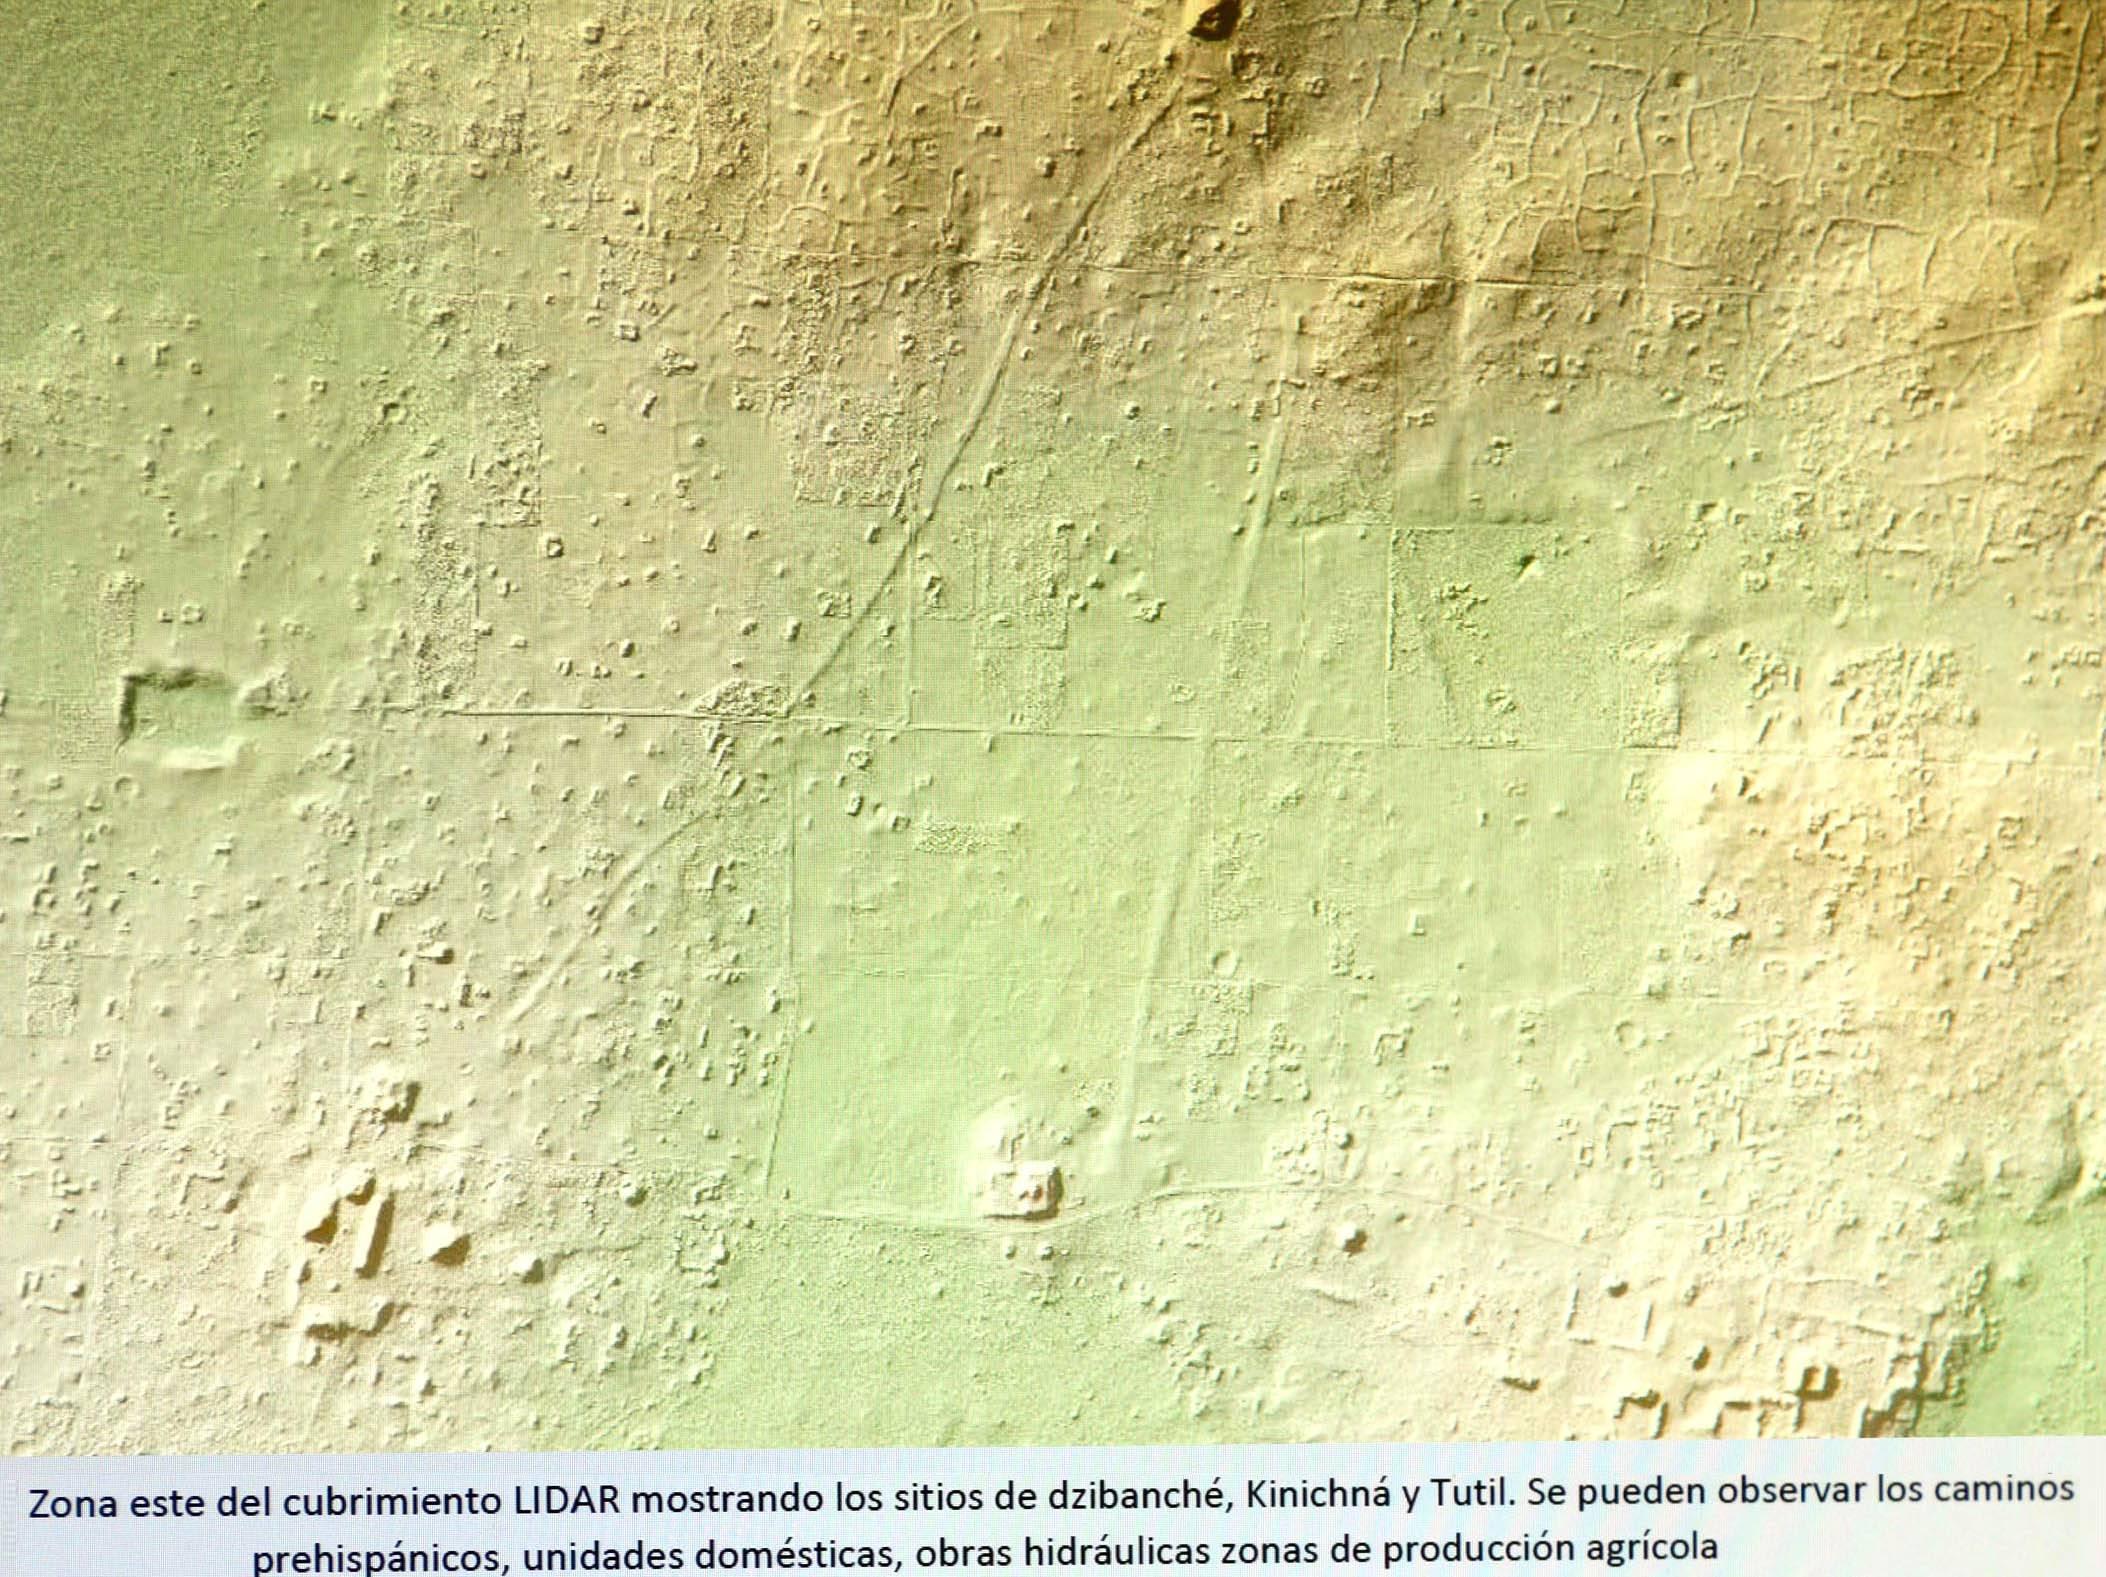 México científicos descubren red de carreteras mayas mediante sensores láser